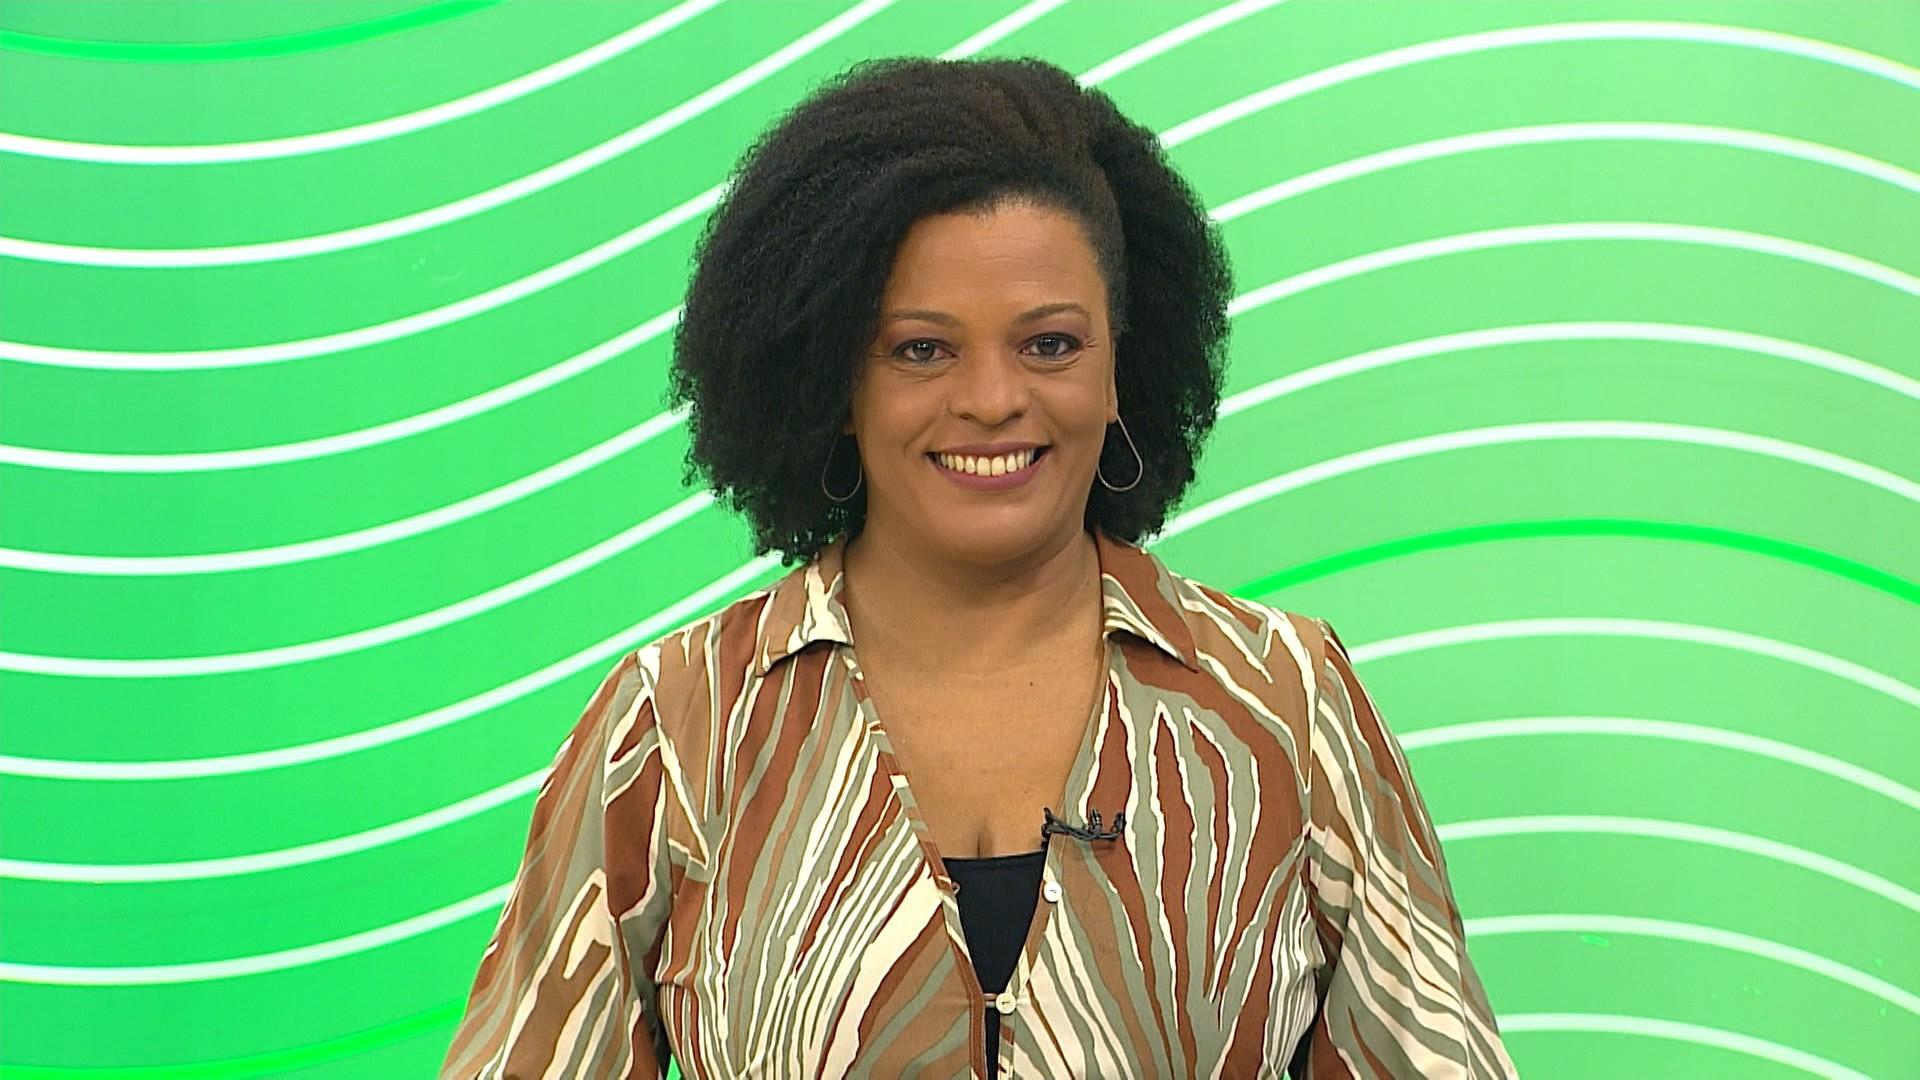 VÍDEOS: Bahia Rural de domingo, 27 de setembro